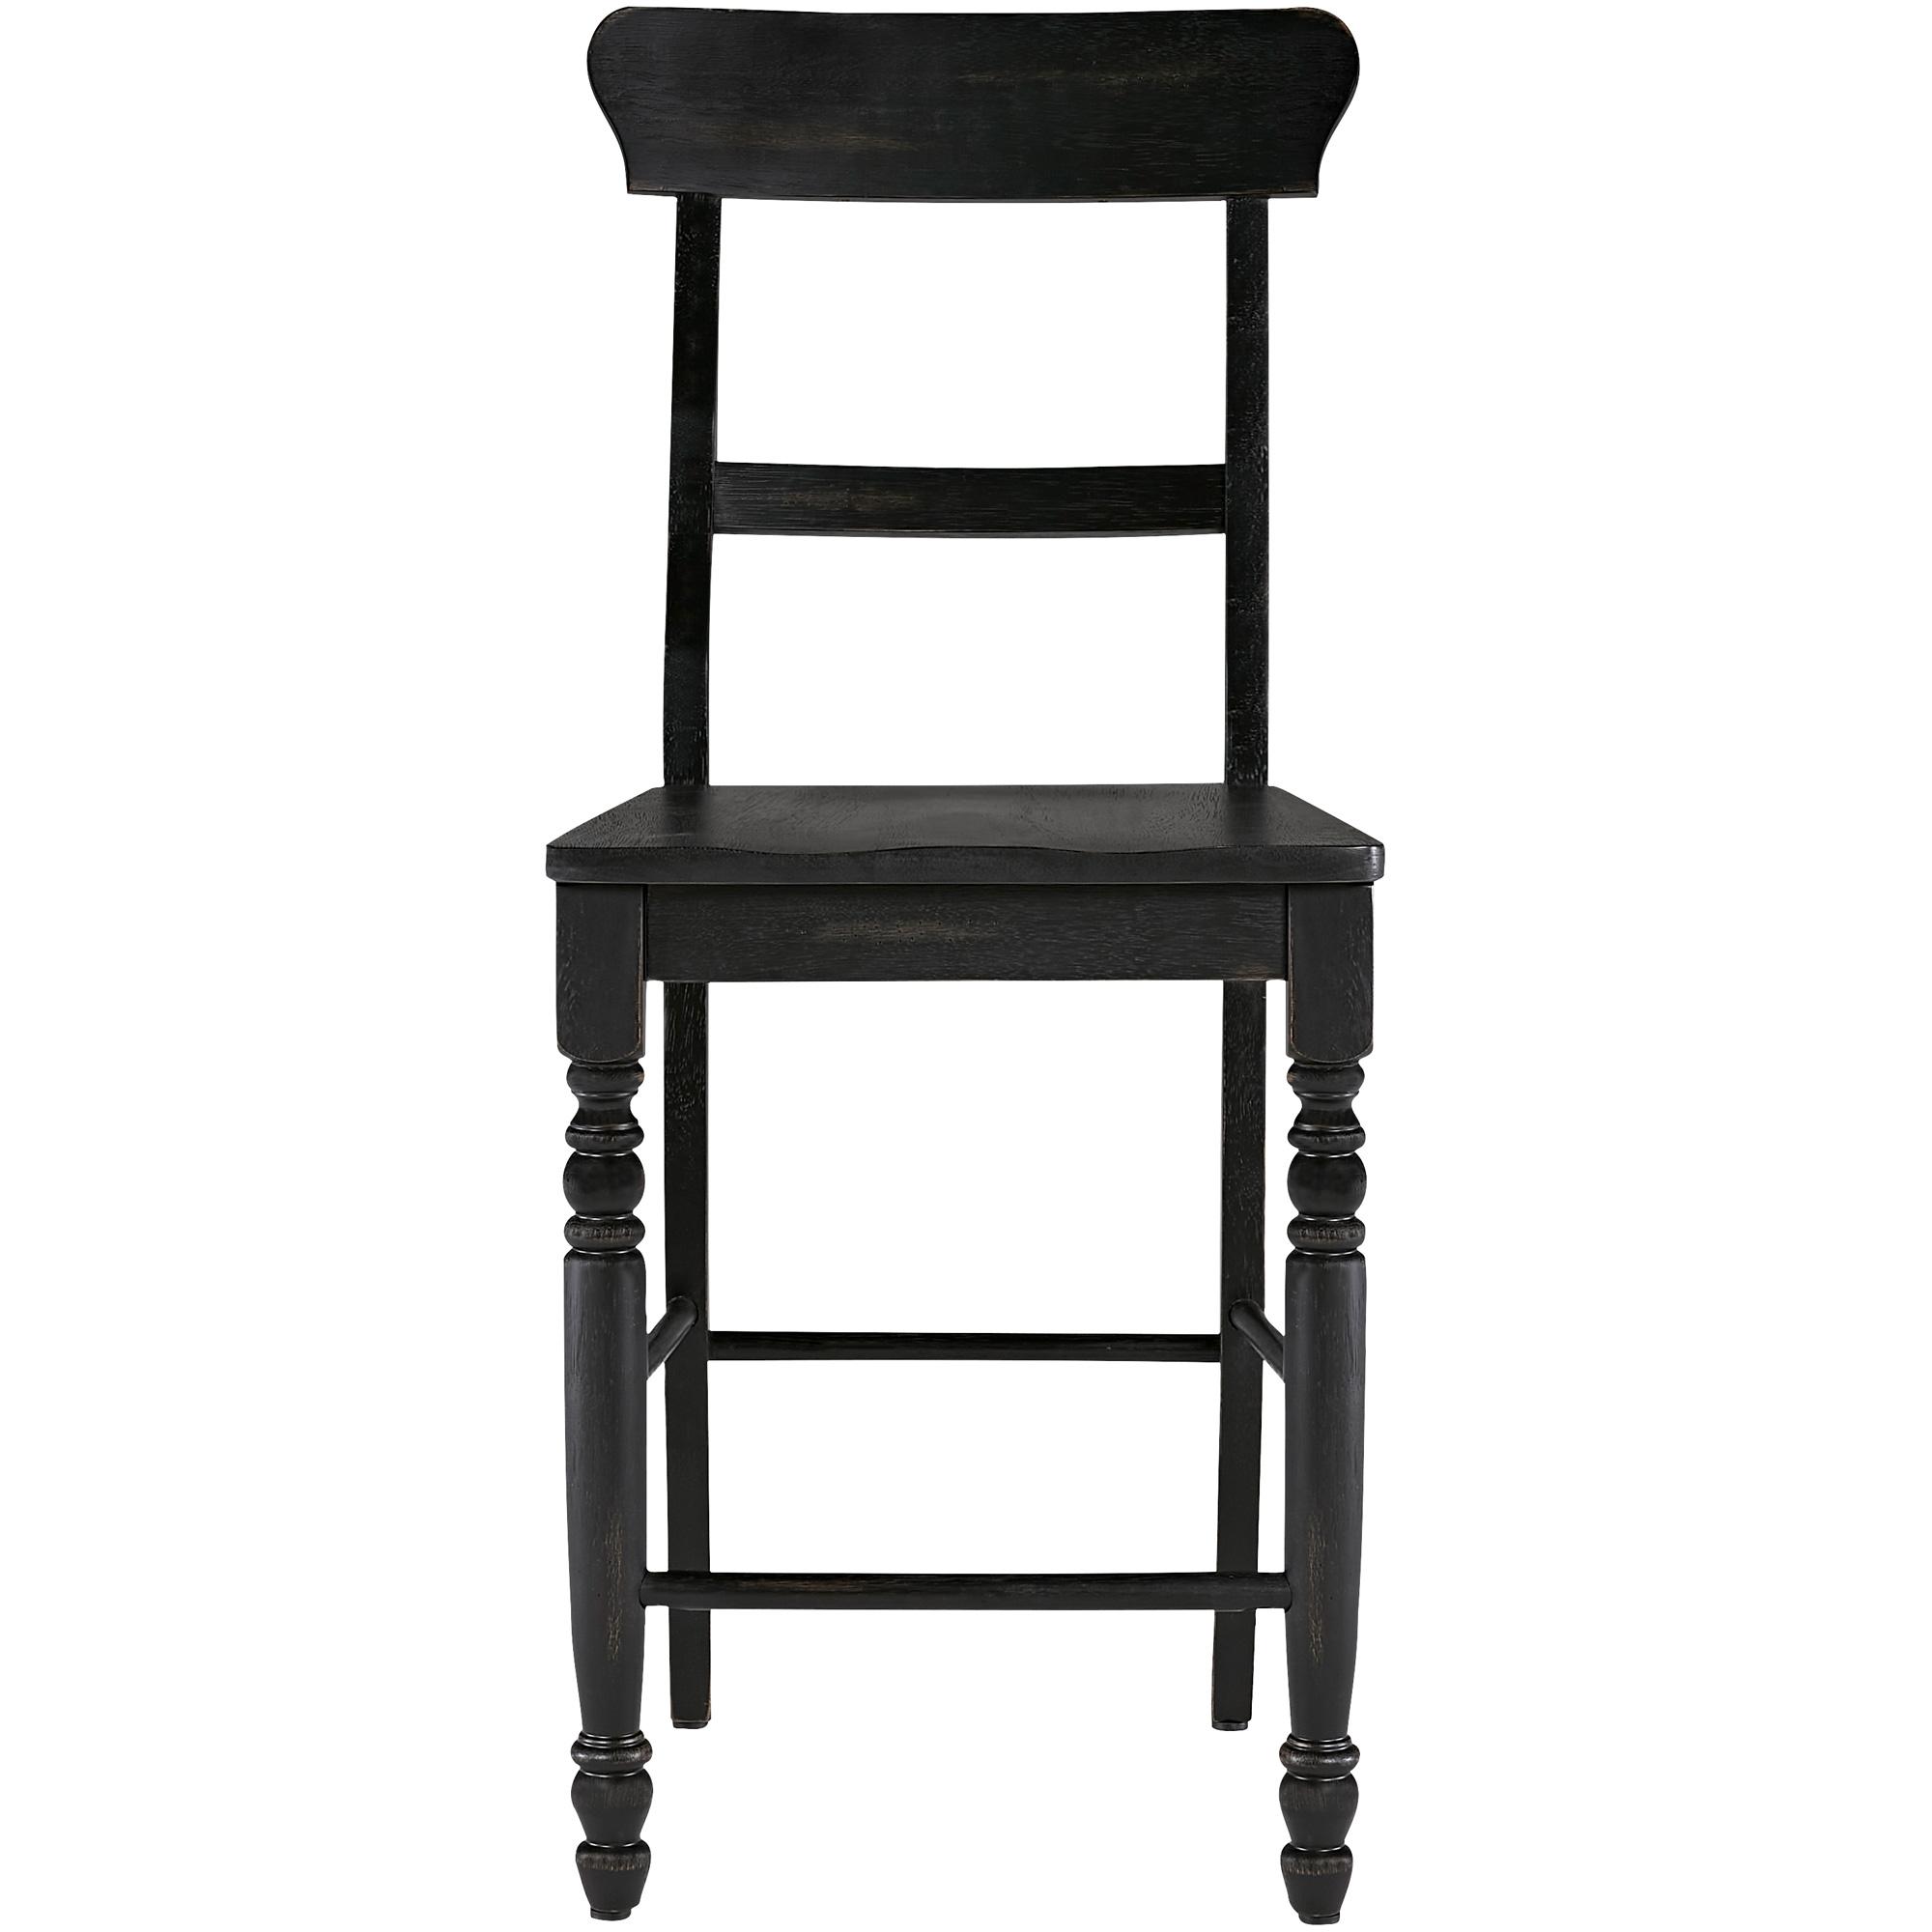 Progressive Furniture Inc. | Savannah Court Antique Black Counter Stool